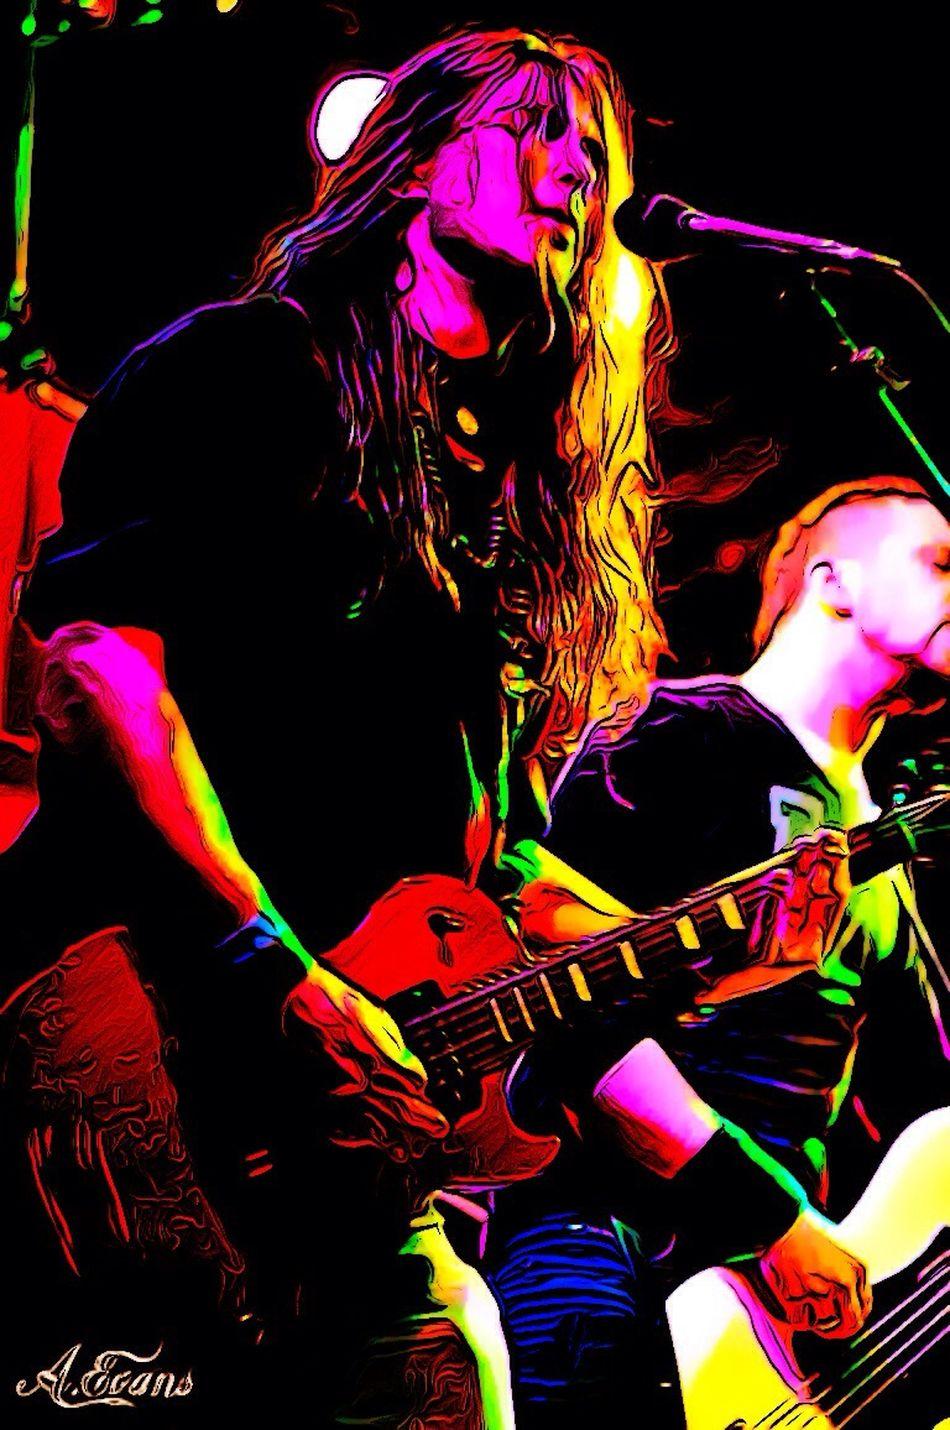 Music Live Music Metal Les Paul In Action Guitar Play Hangar110 Attilio Negri